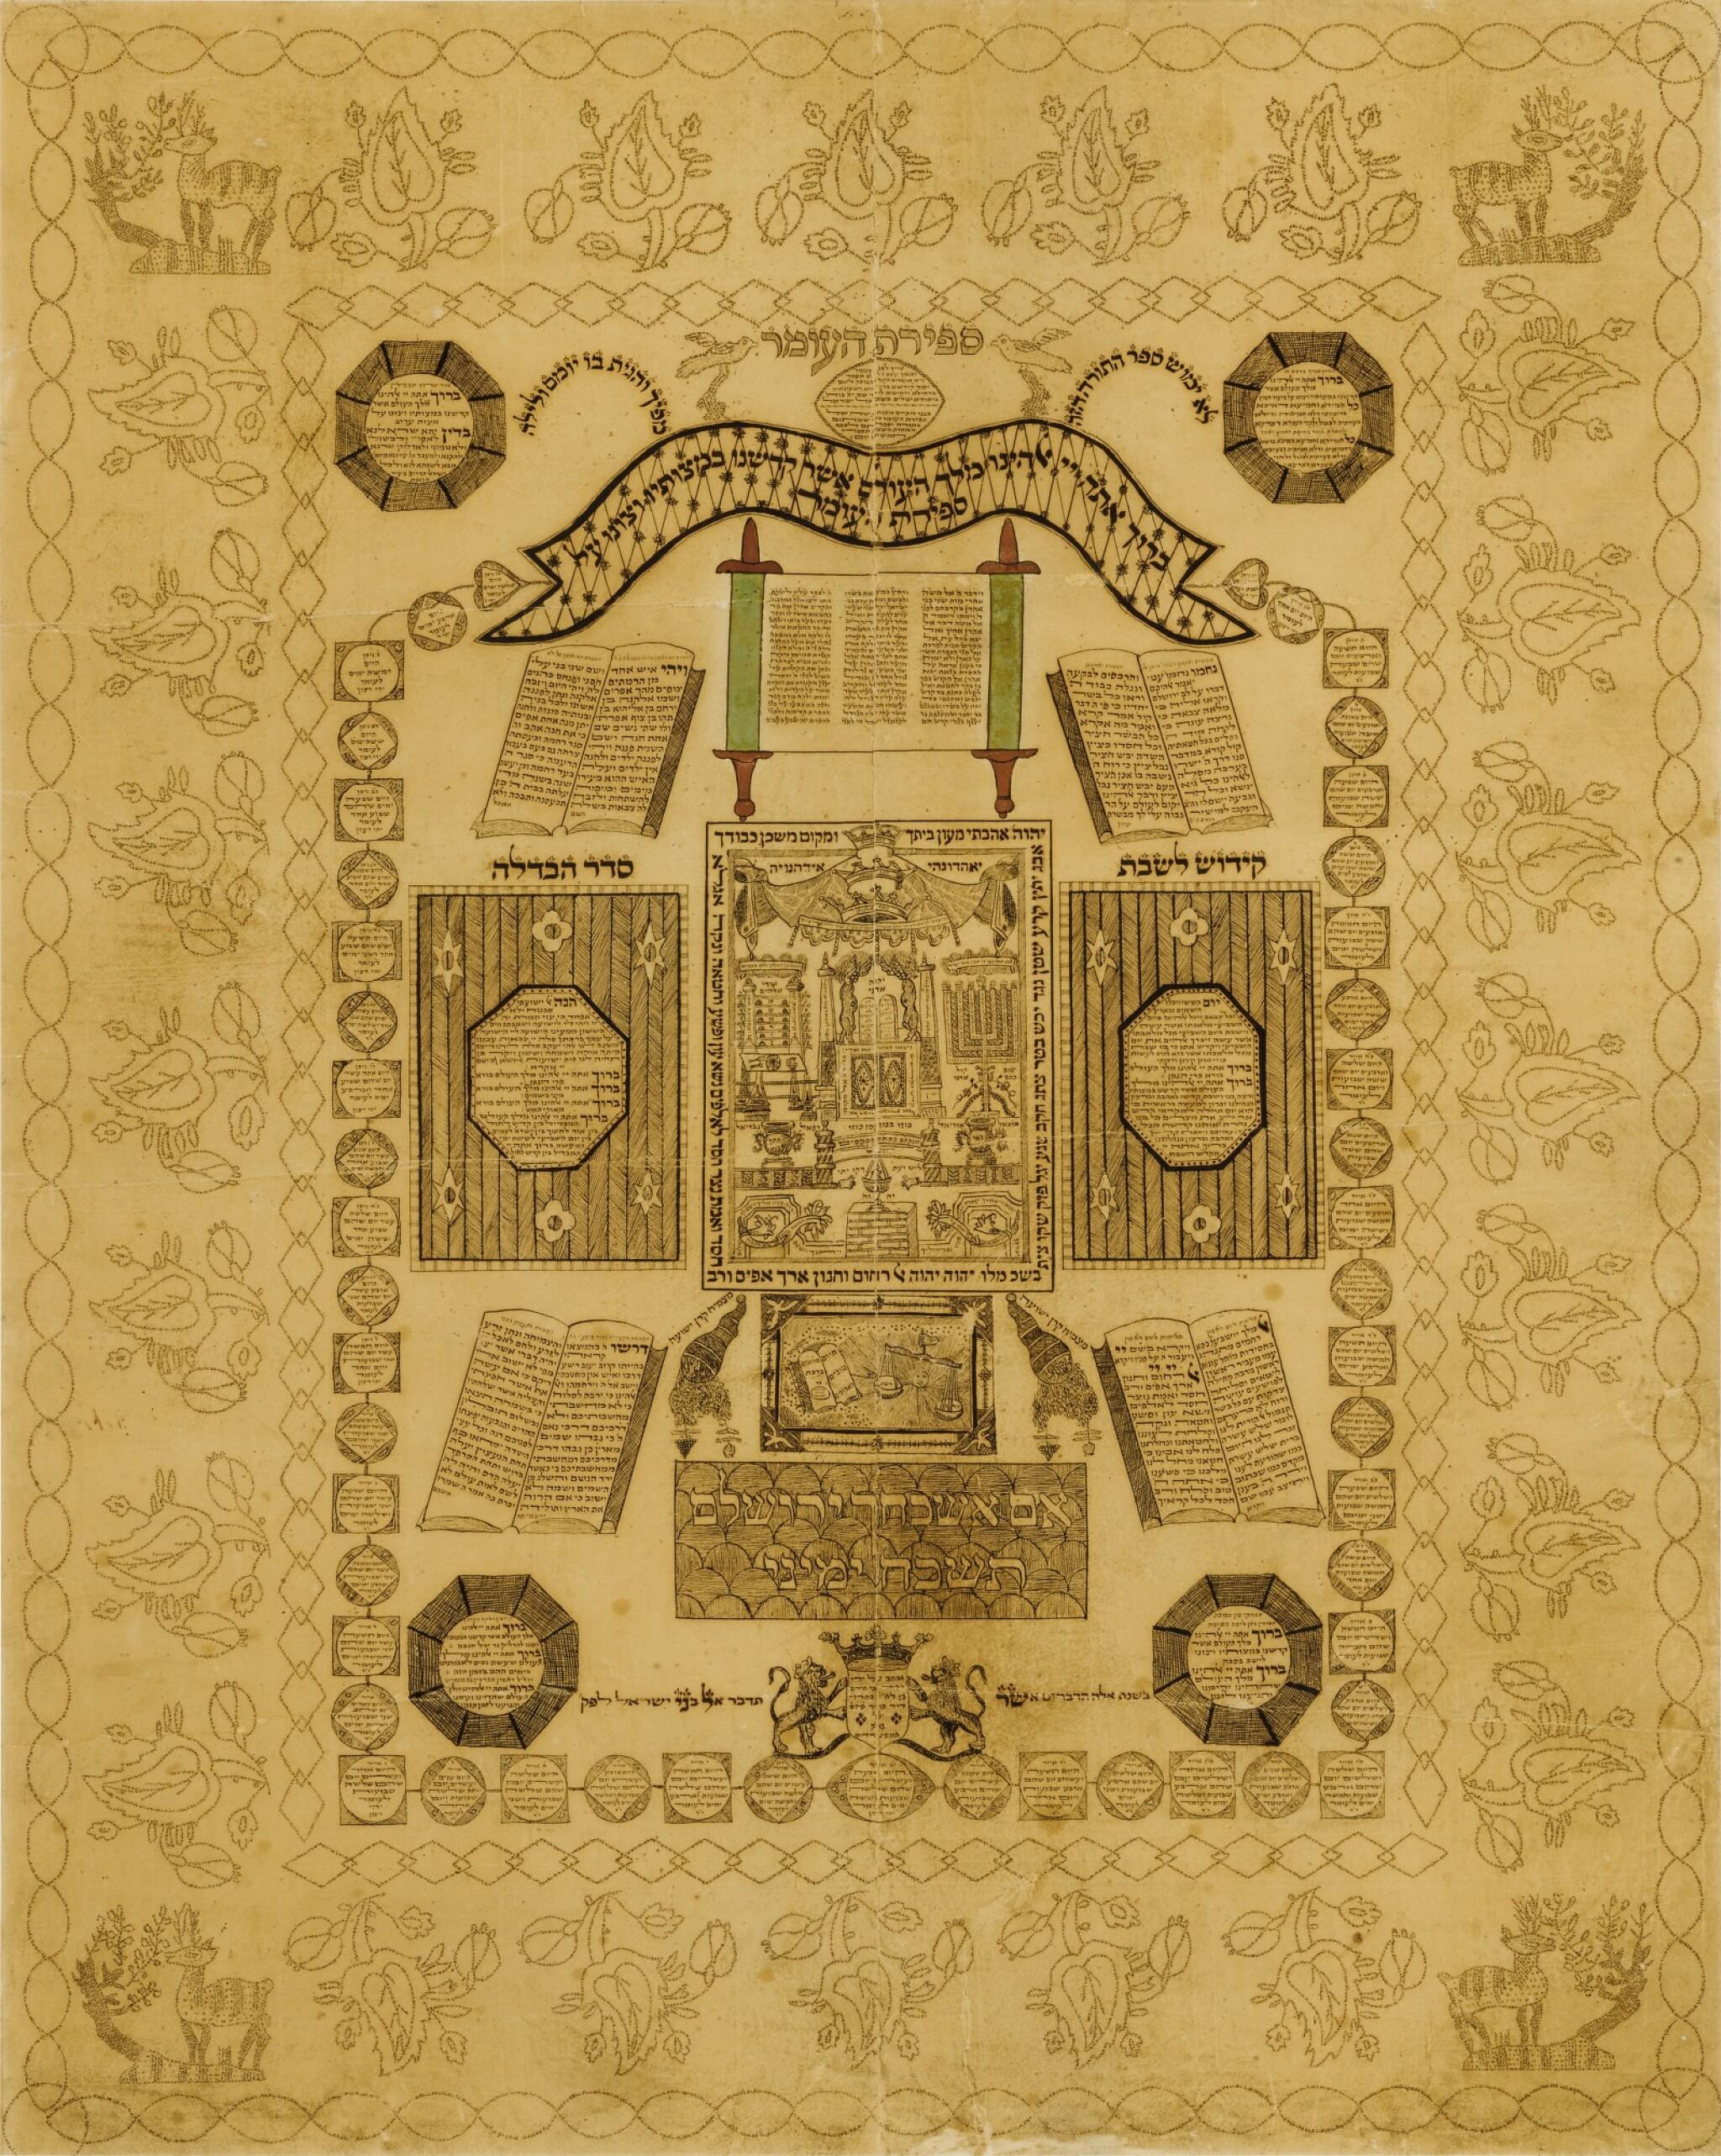 View full screen - View 1 of Lot 173. A MAGNIFICENT MICROGRAPHIC OMER CALENDAR, ZEVI HIRSCH BEN DAVID, AMSTERDAM: 1830.